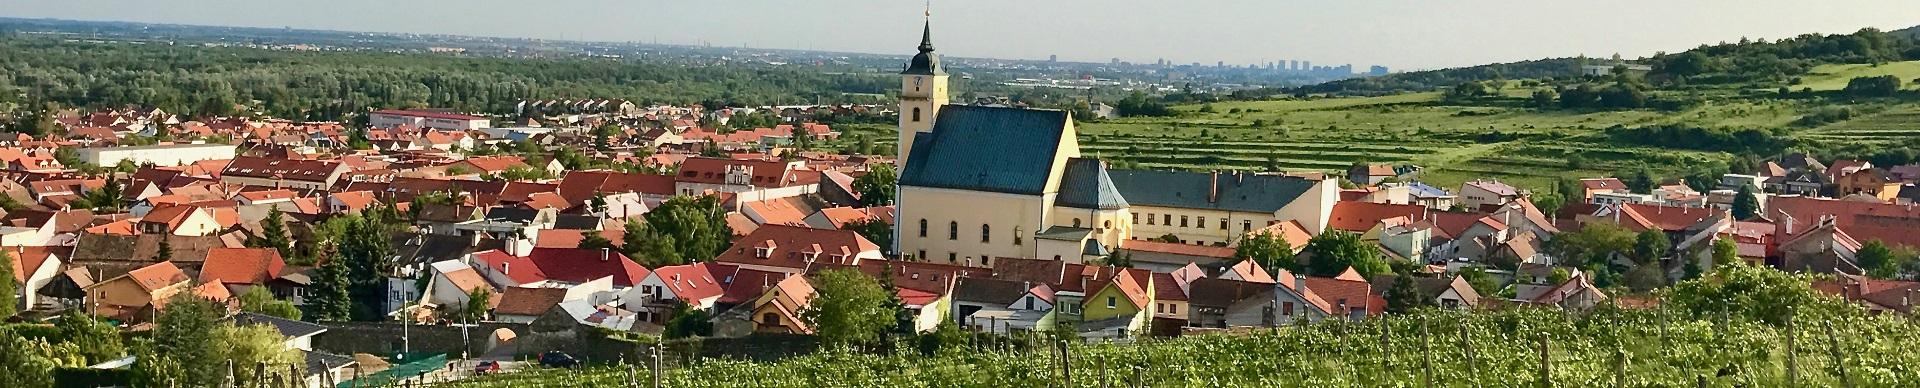 Weinbau der Slowakei